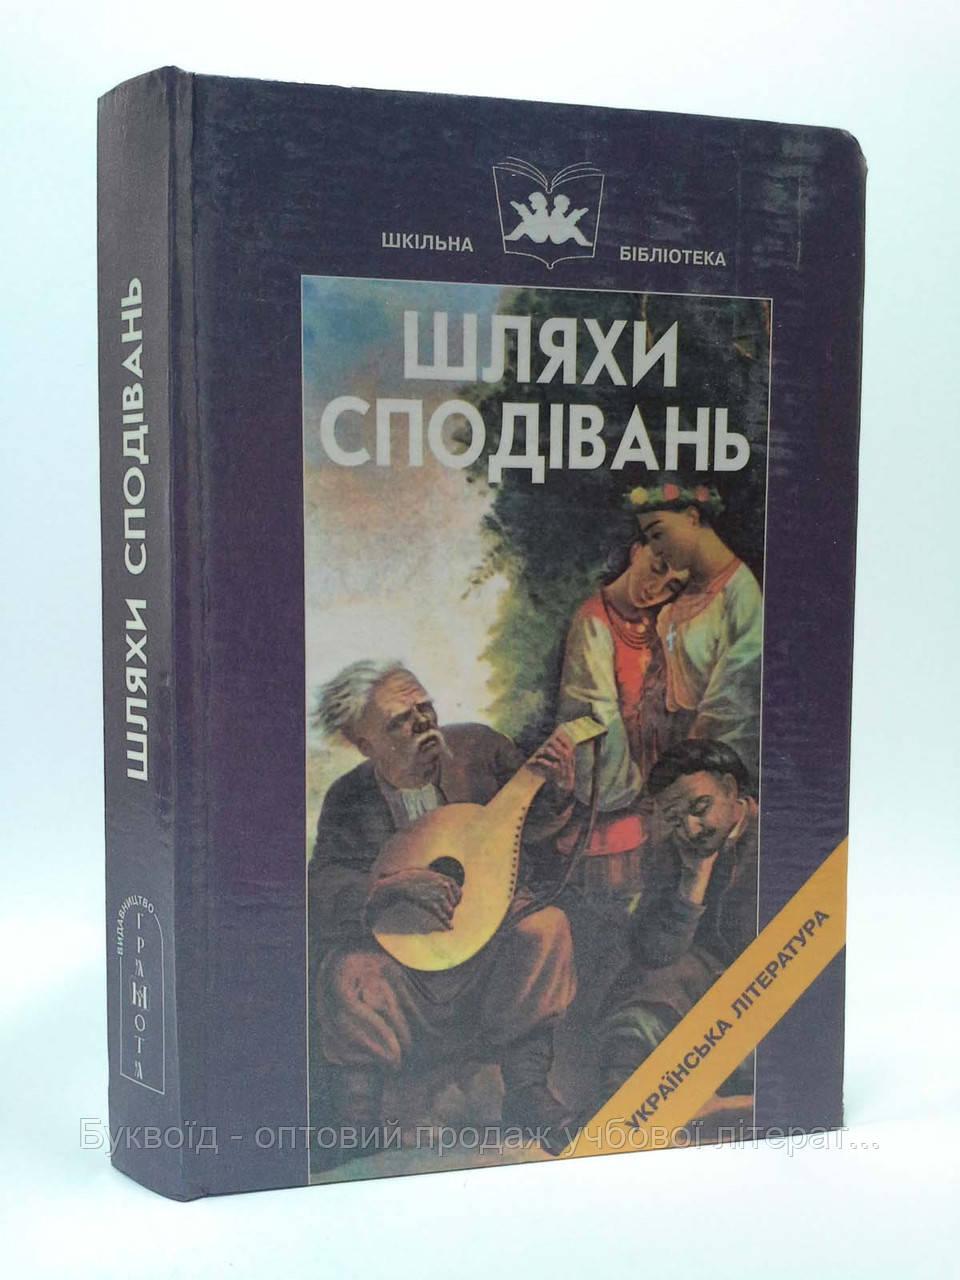 Грамота Шляхи сподівань Укр література кінця 18 початку 20 ст. Шкляр